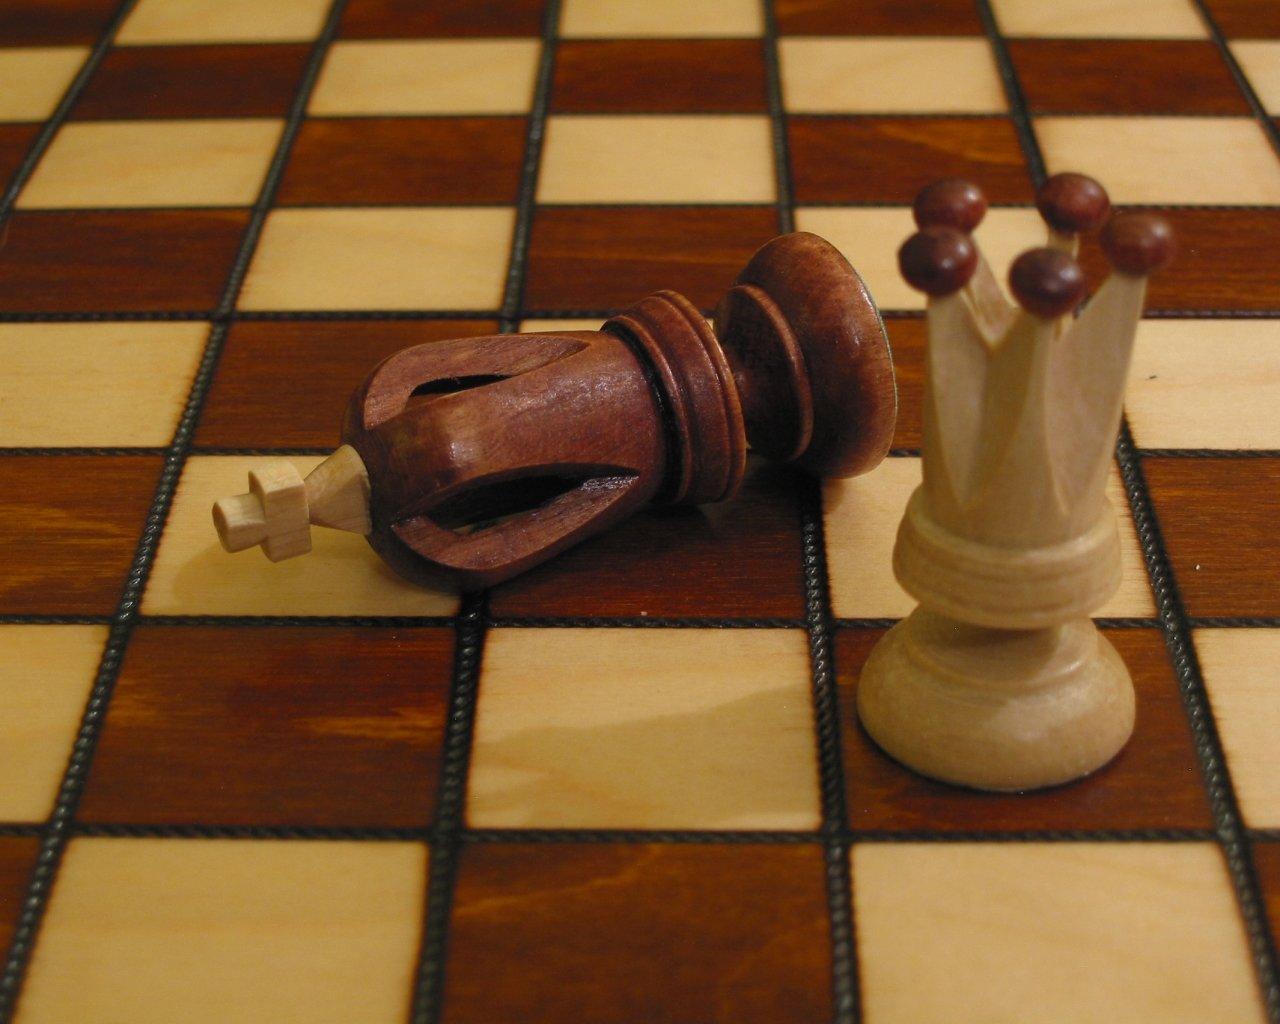 Best Chess Wallpaper Id378902 For High Resolution Hd 1280x1024 Computer